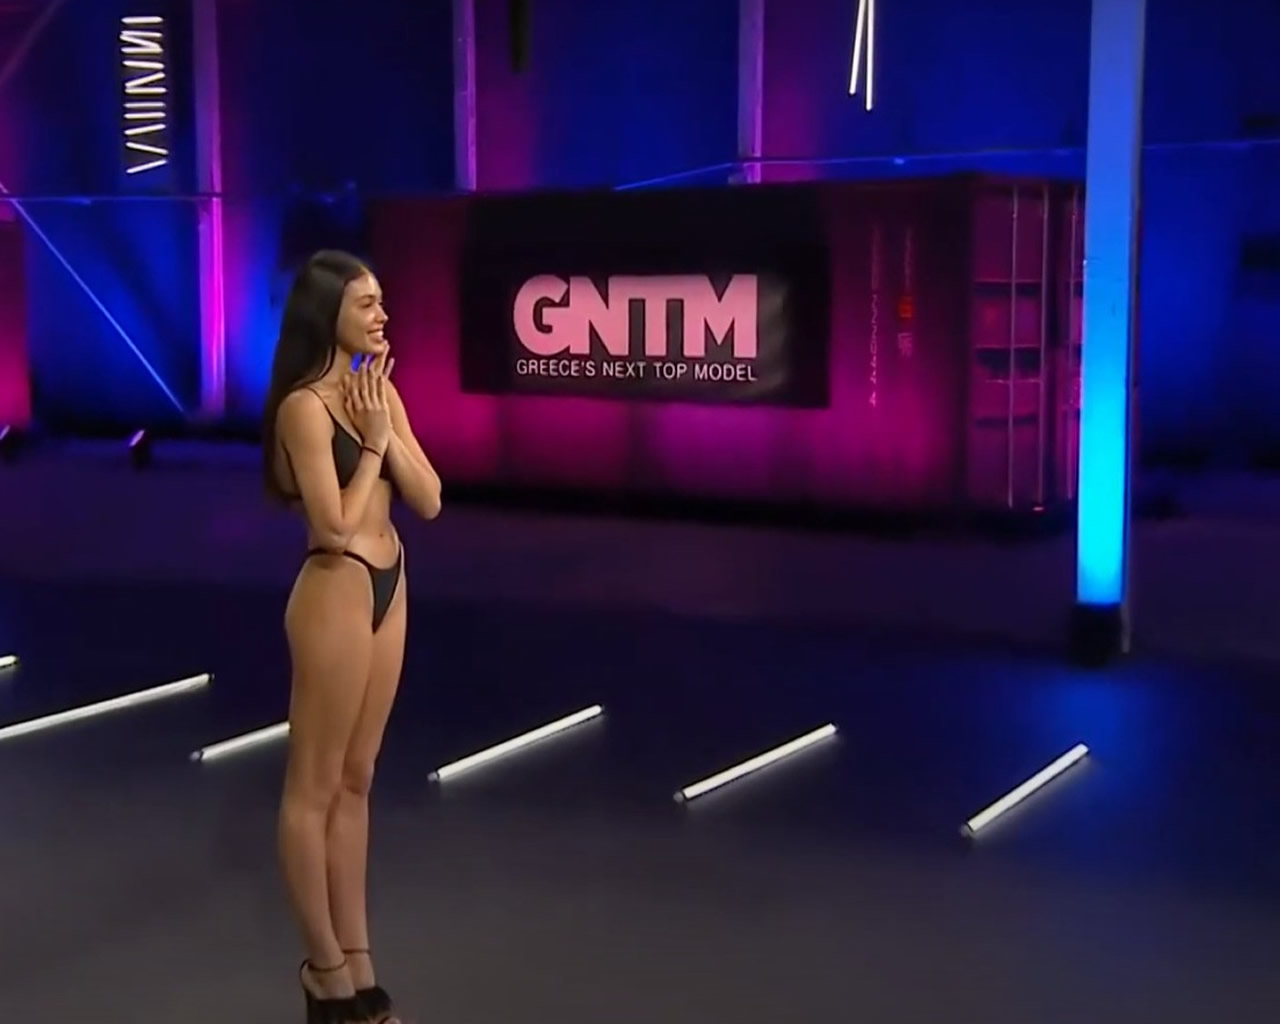 gntm Στέλλα - Βικτώρια